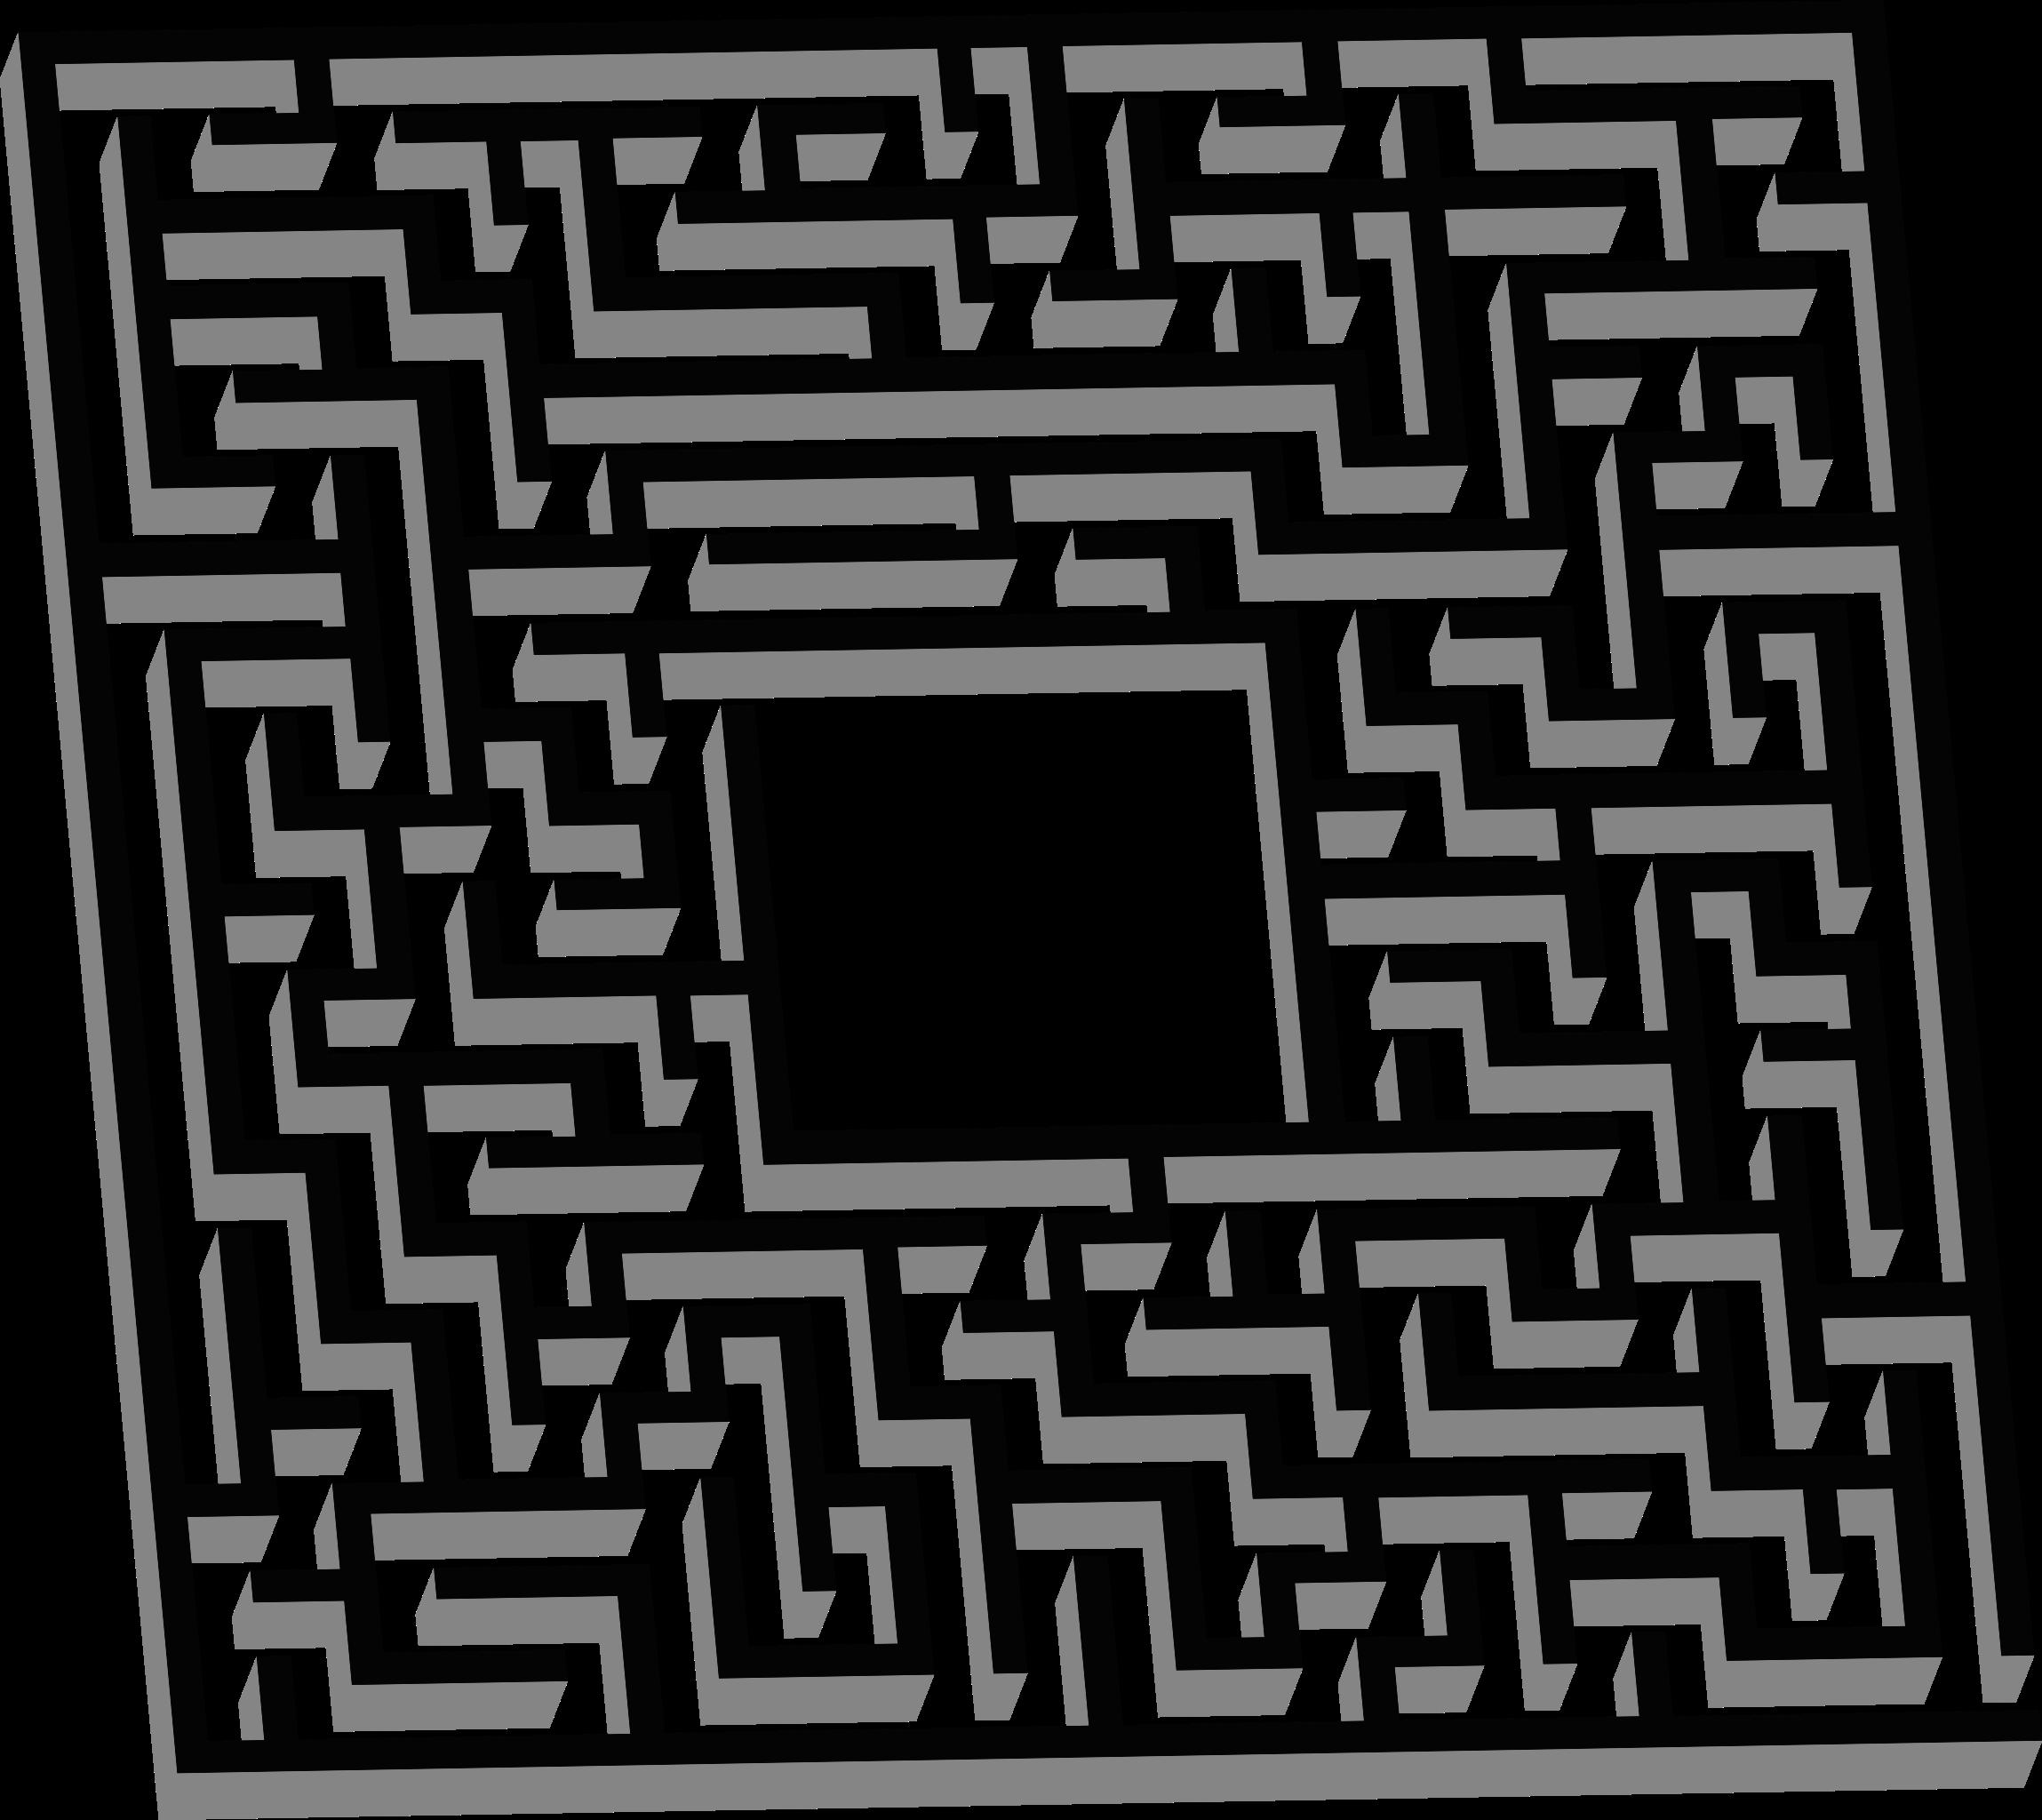 free download D big image png. Maze clipart